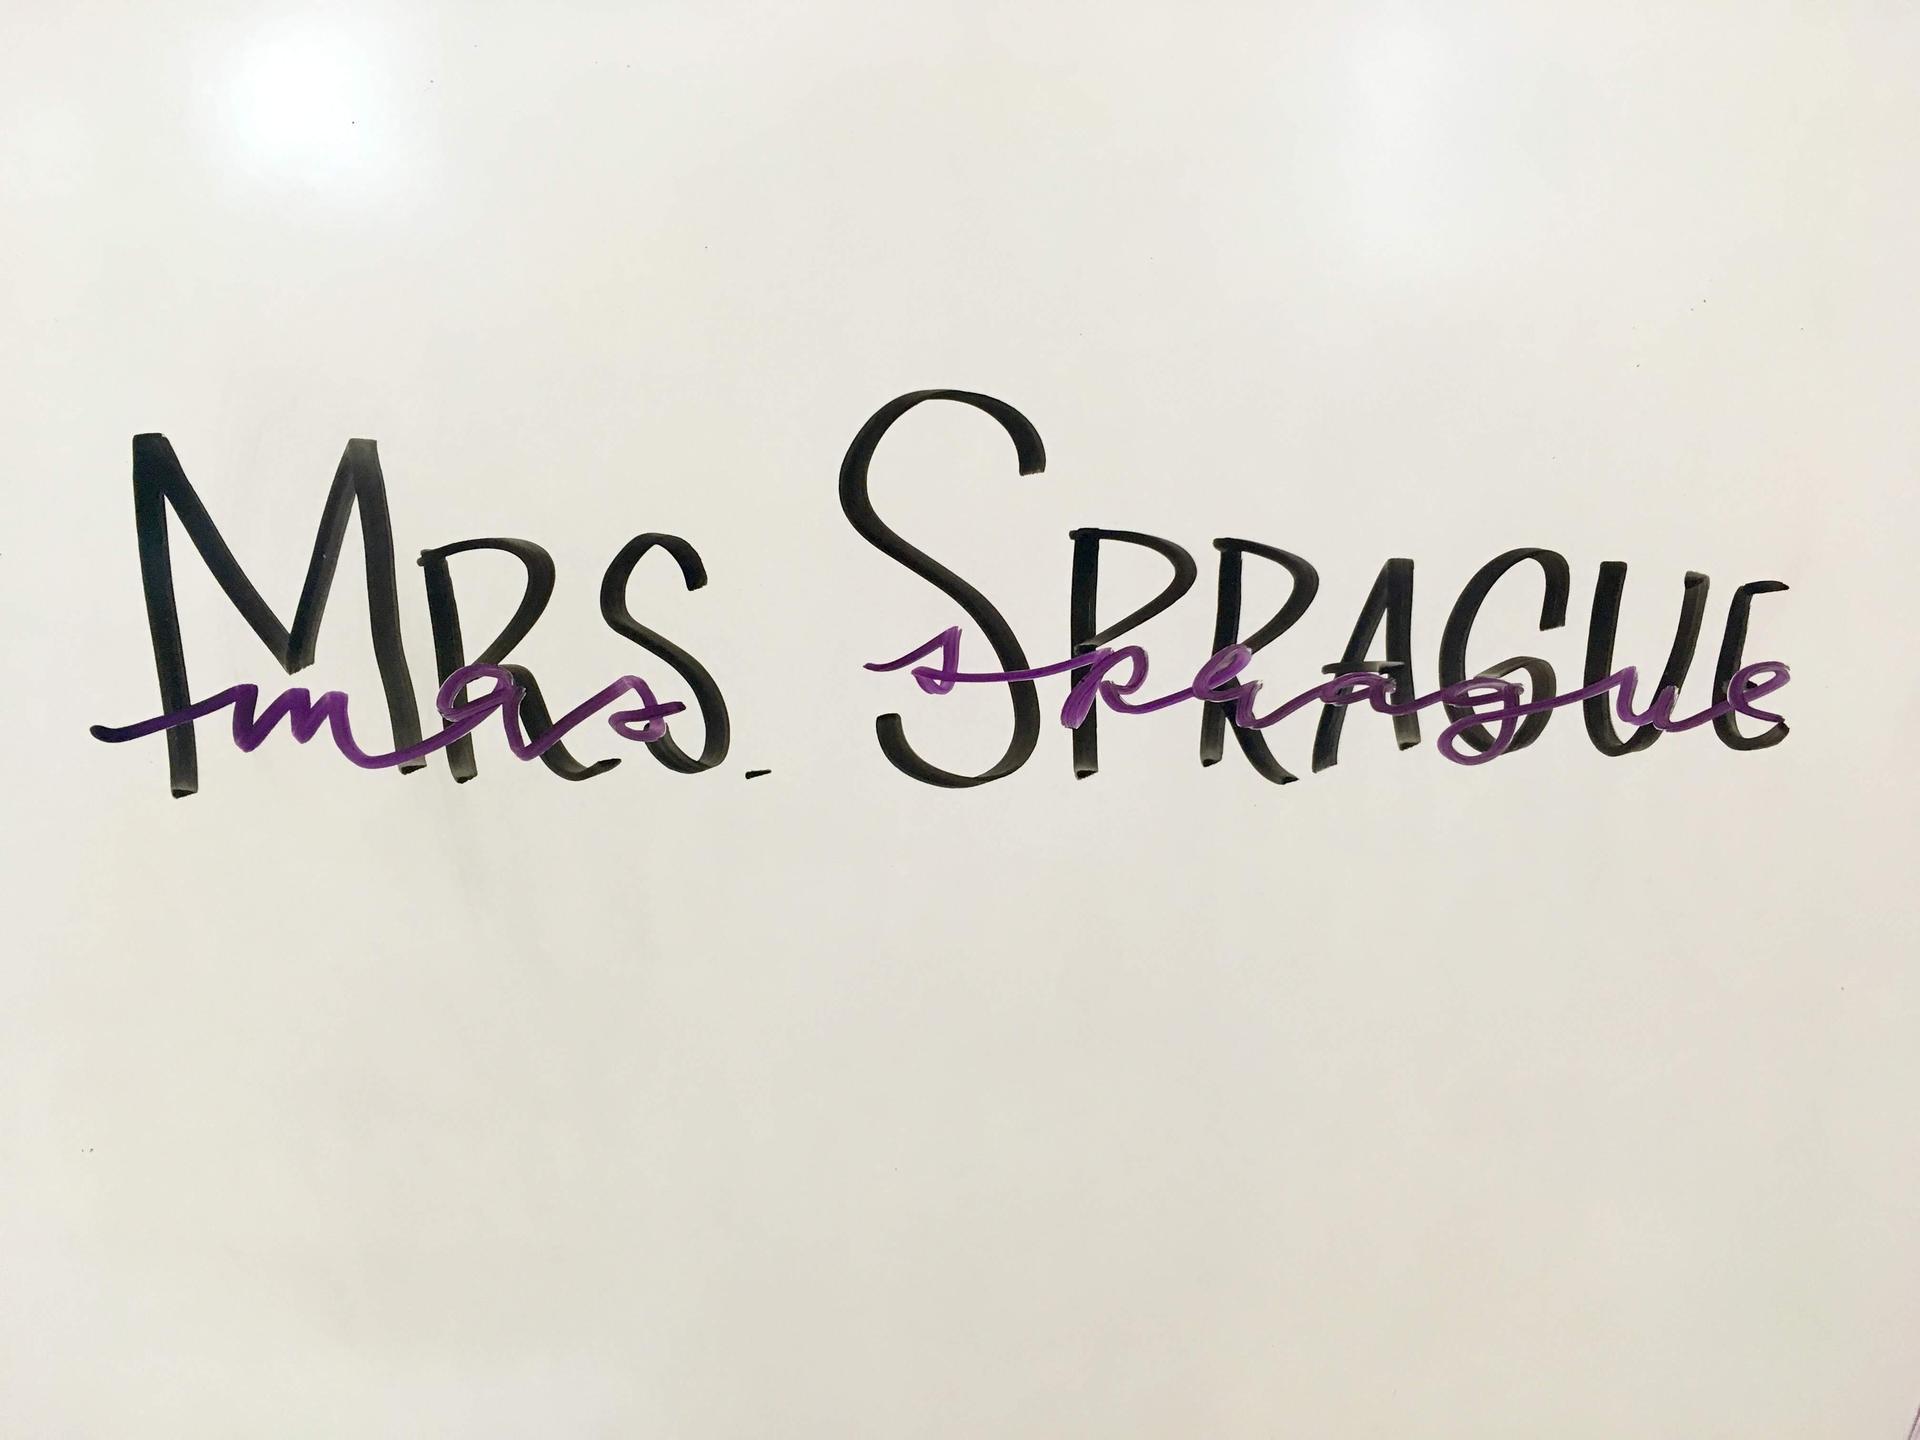 Mrs. Sprague